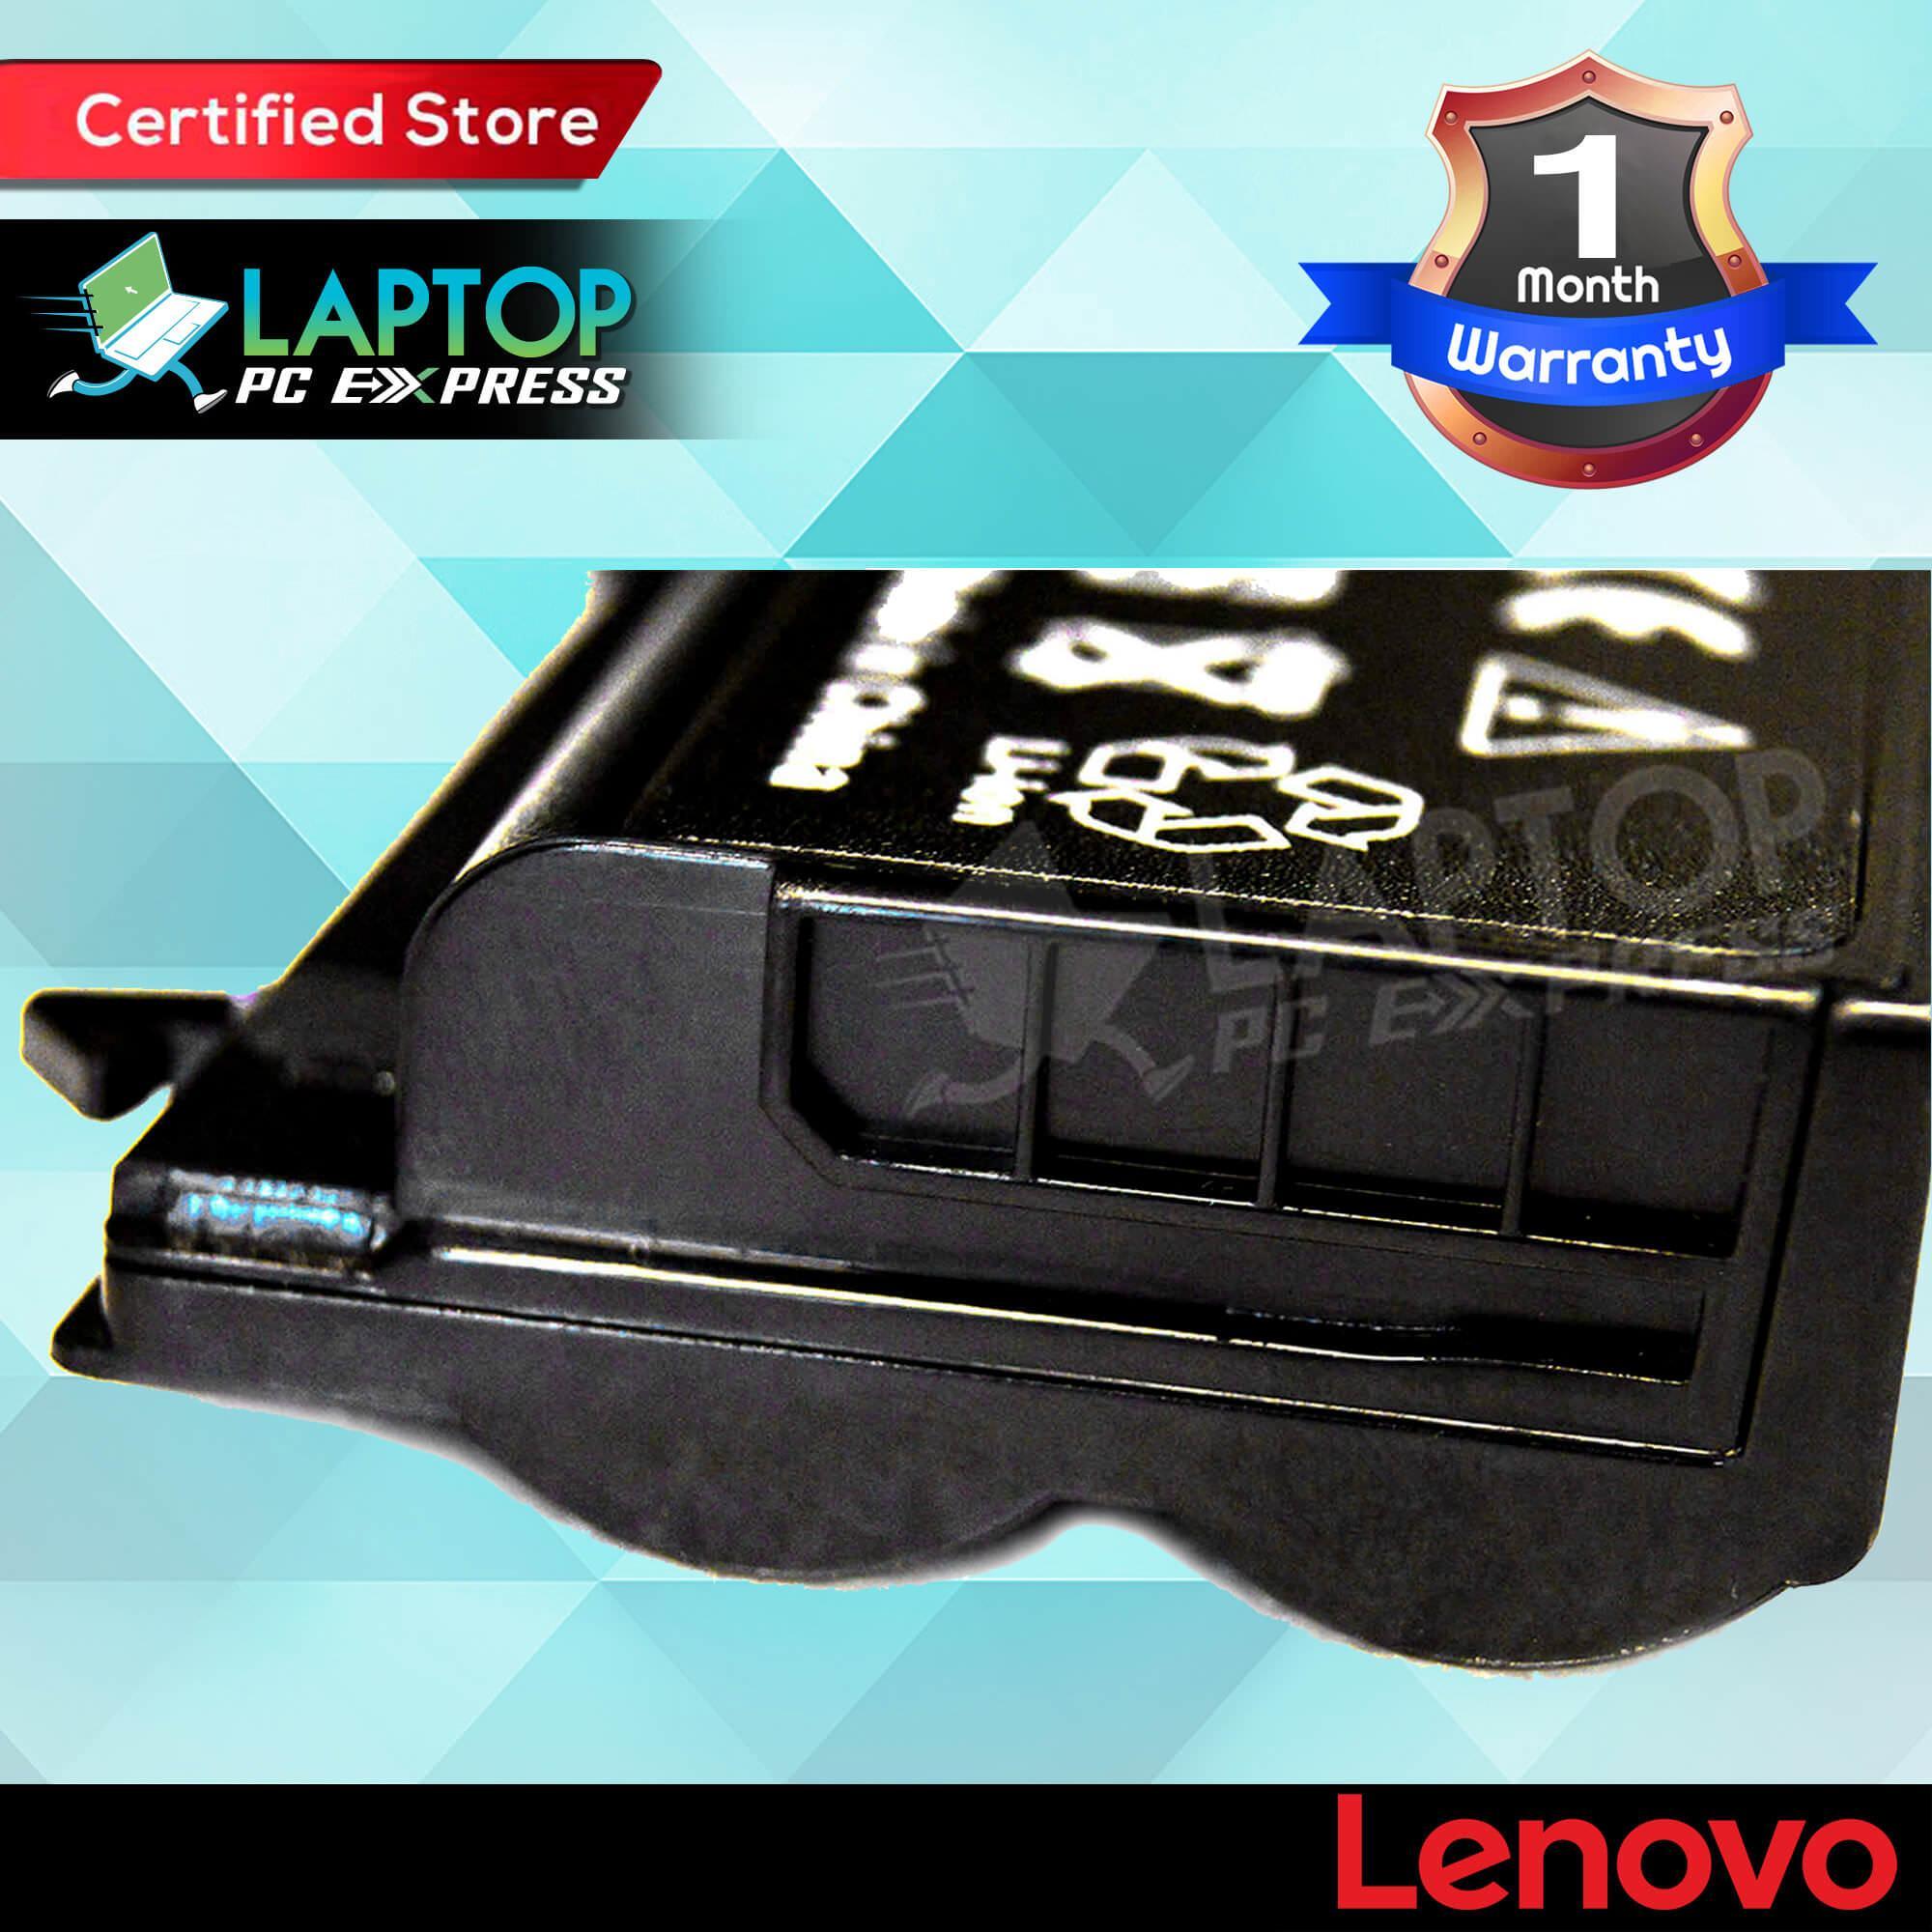 Lenovo Laptop Battery For ThinkPad SL410 SL510 T410 T410i T420 T510 T510i  T520 T520i W510 W520 ThinkPad Edge 0578-47B / 05787UJ / 05787VJ / 05787WJ /